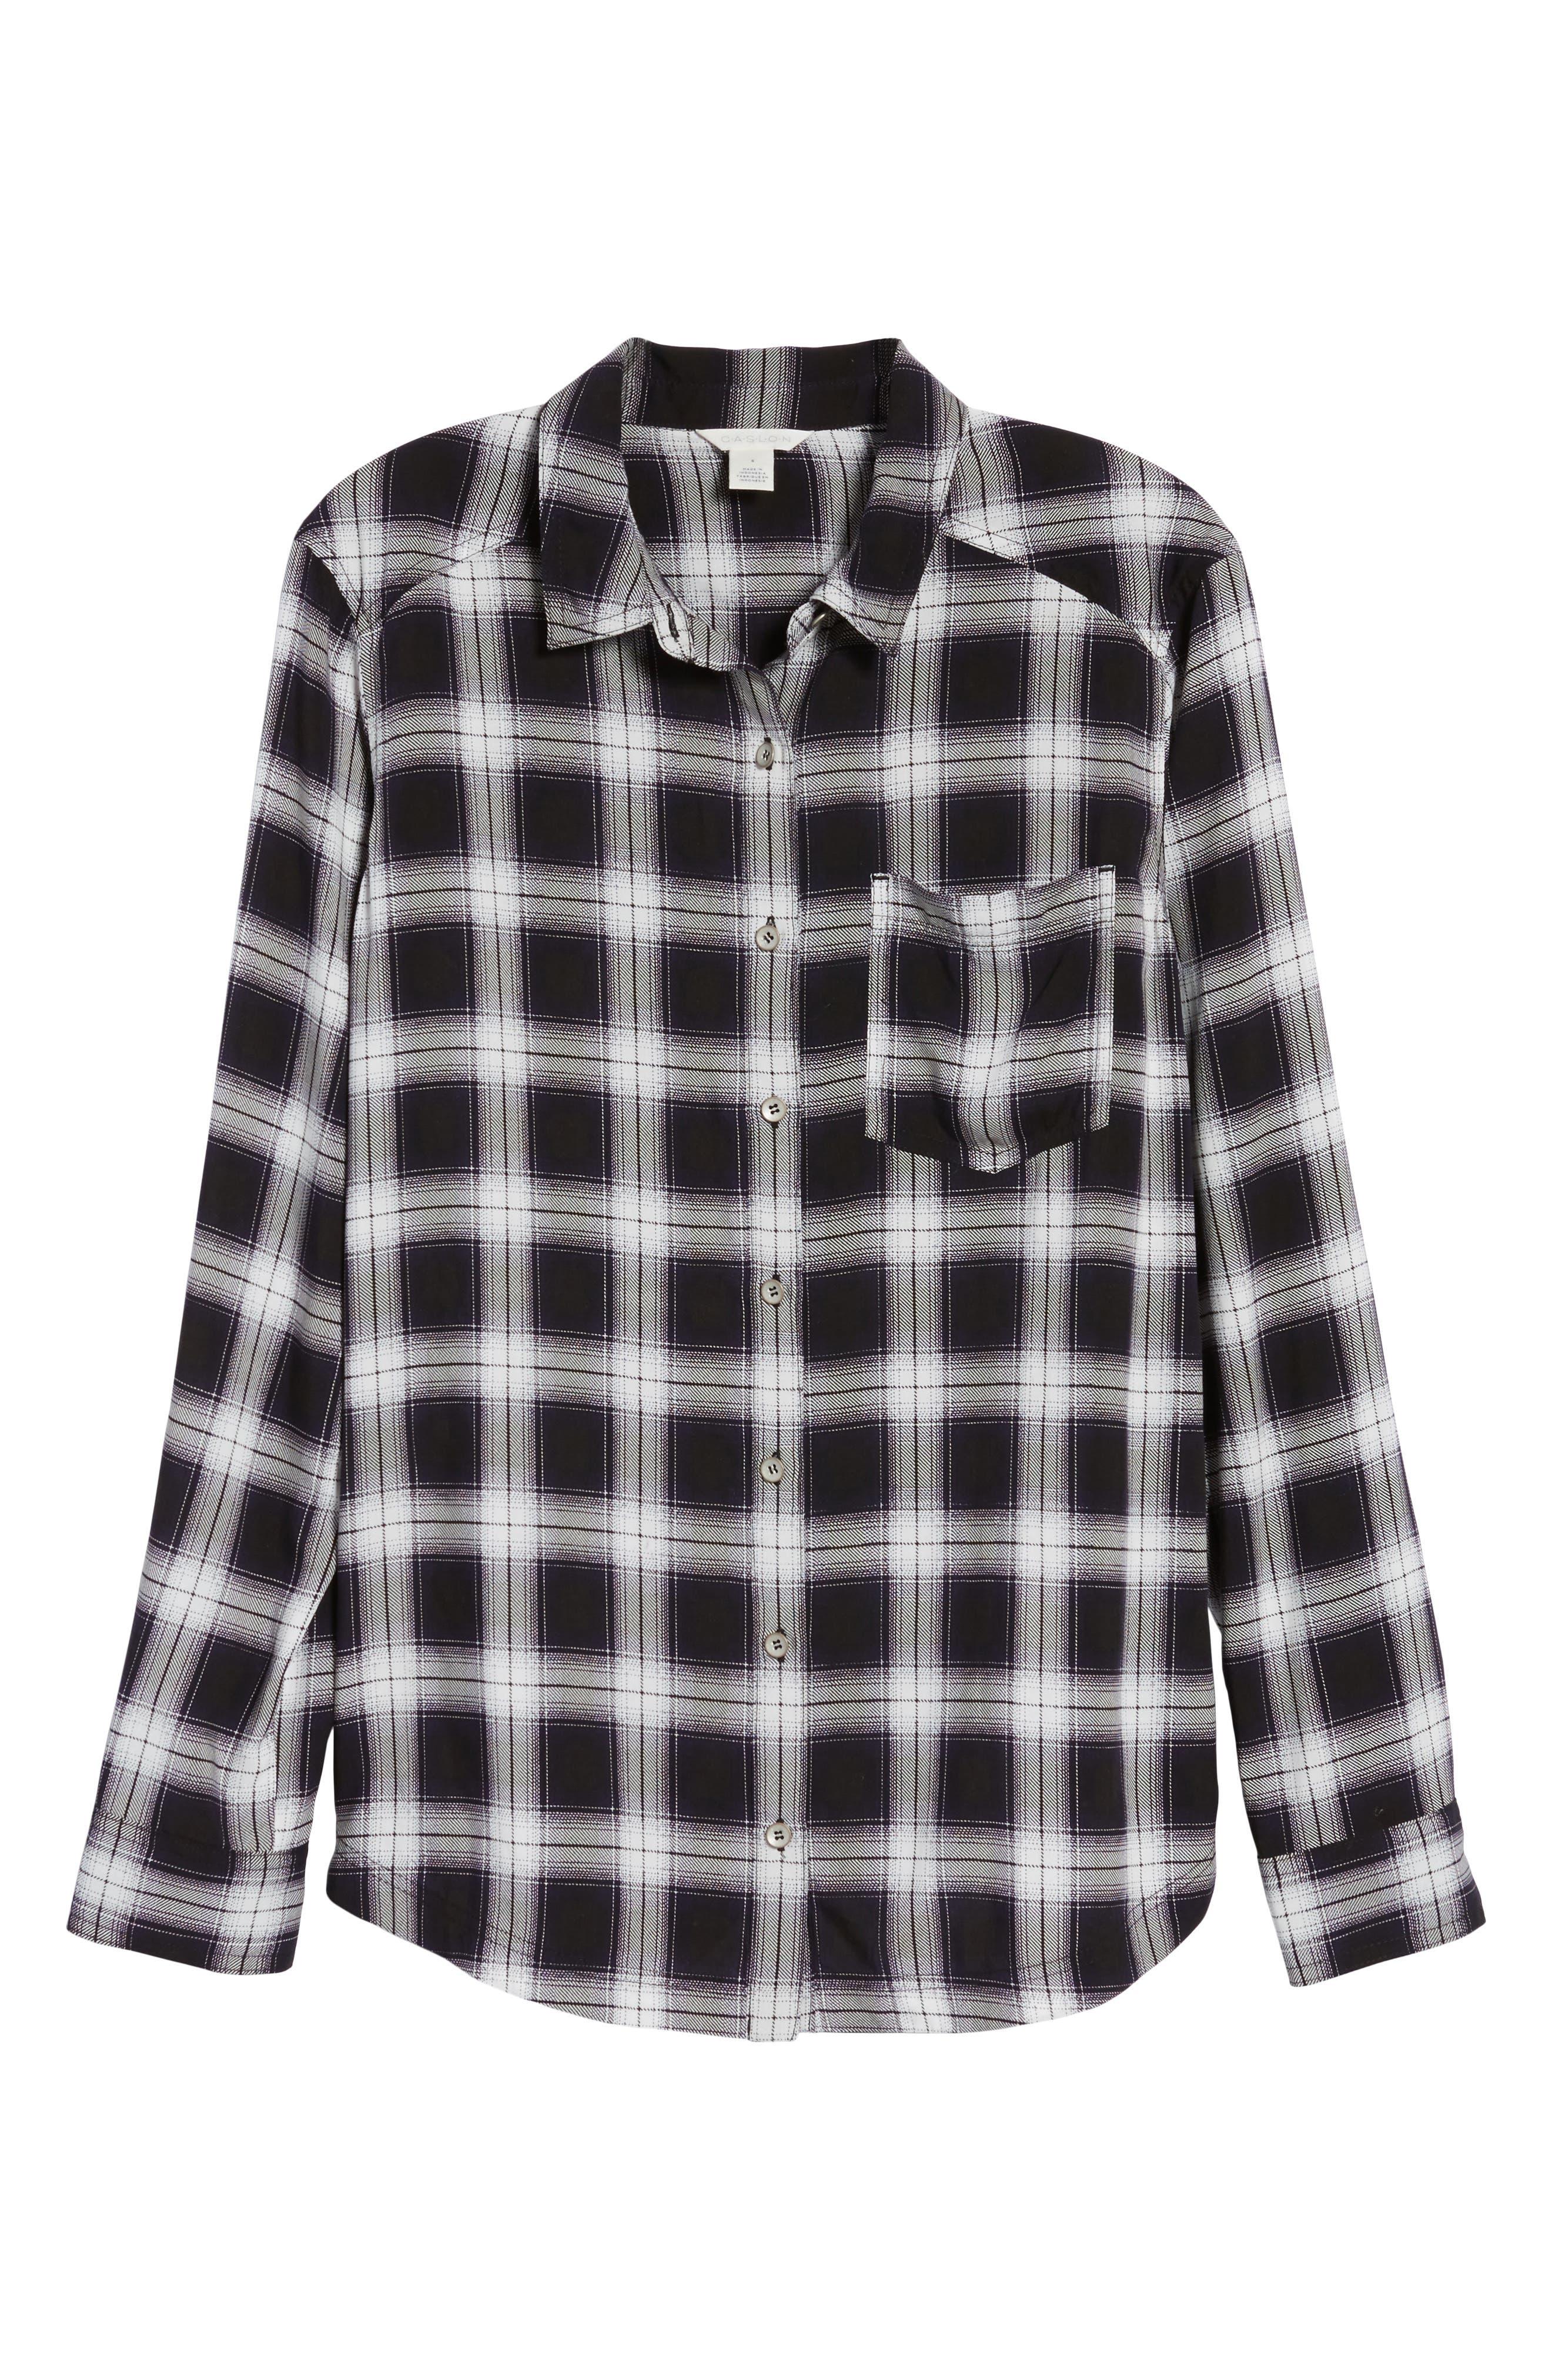 Plaid Shirt,                             Alternate thumbnail 6, color,                             Black- White Plaid